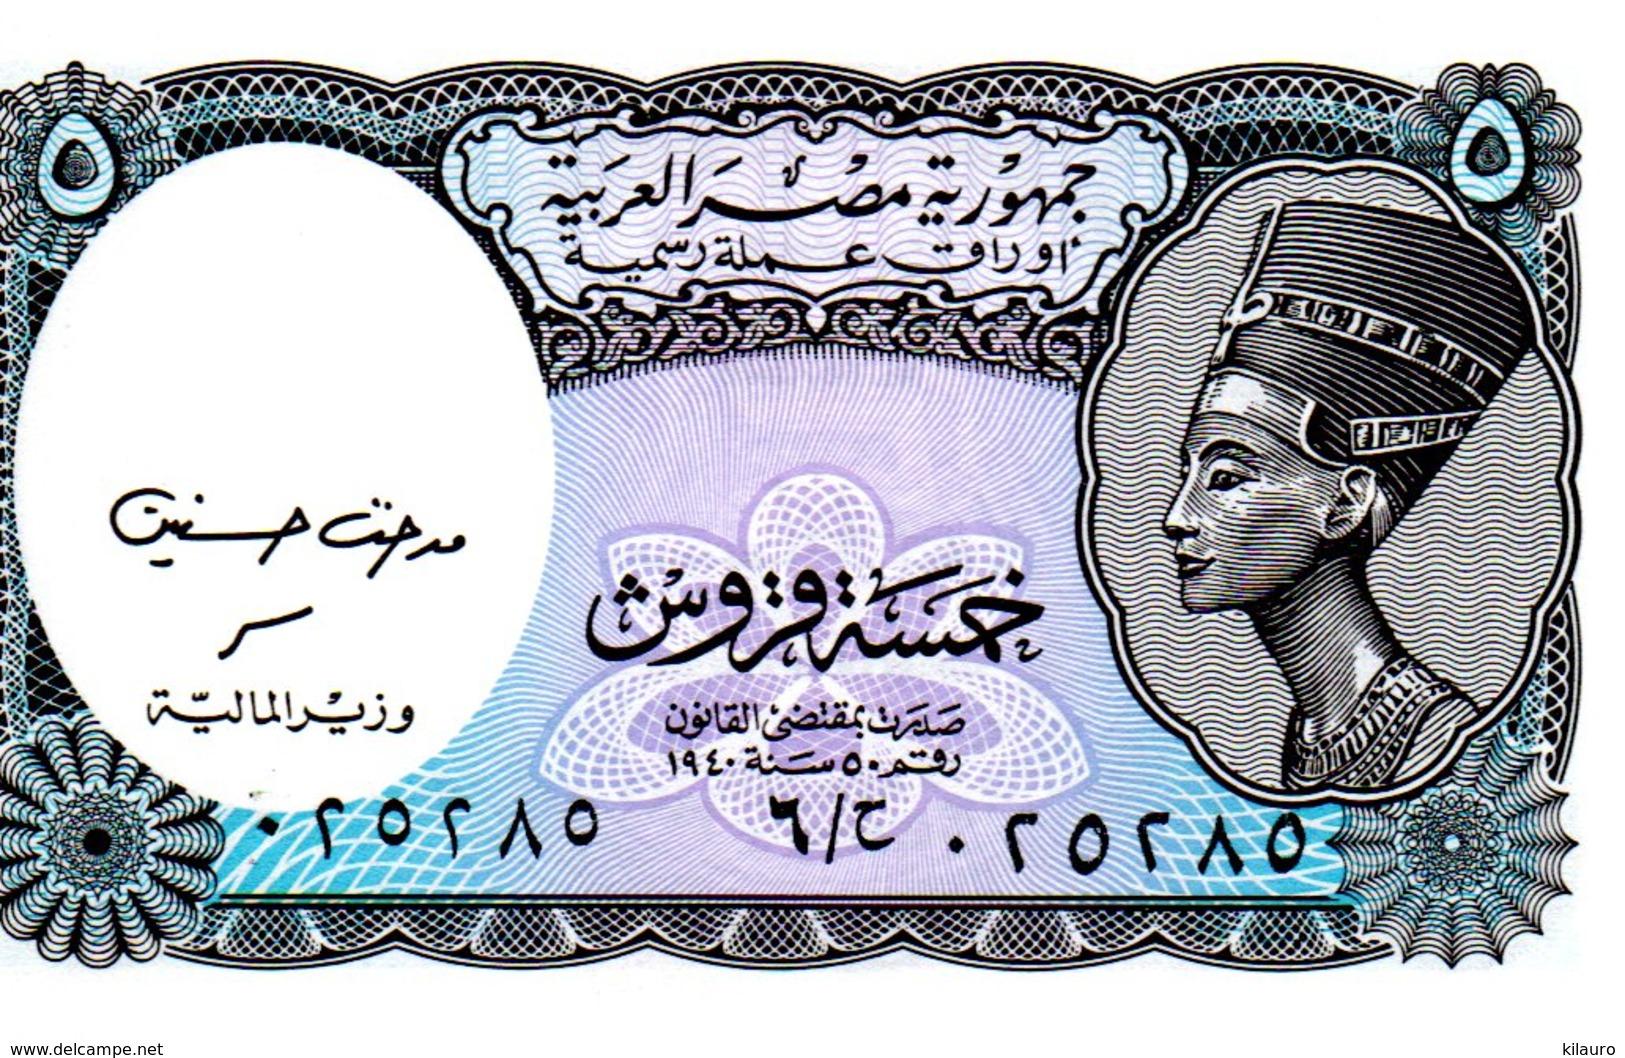 EGYPTE Billet 5 Piastres Currency Note - The Arab Républic Of Egypt TBE - Egypt